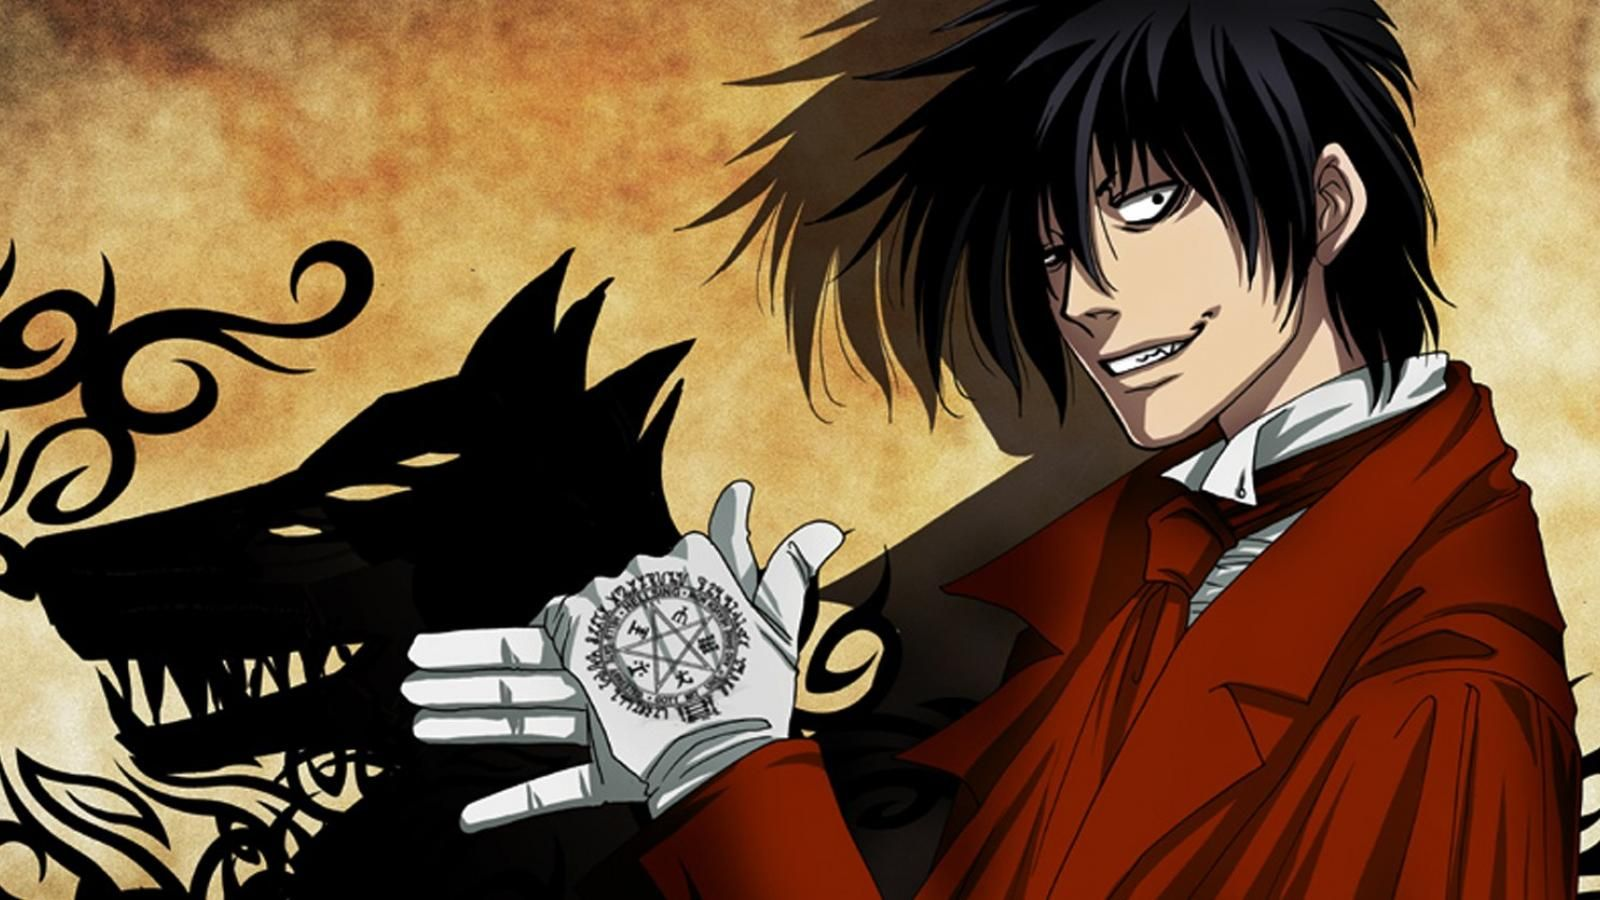 Anime Hellsing Ultimate Alucard Hellsing 2436987 Jpeg 1600 900